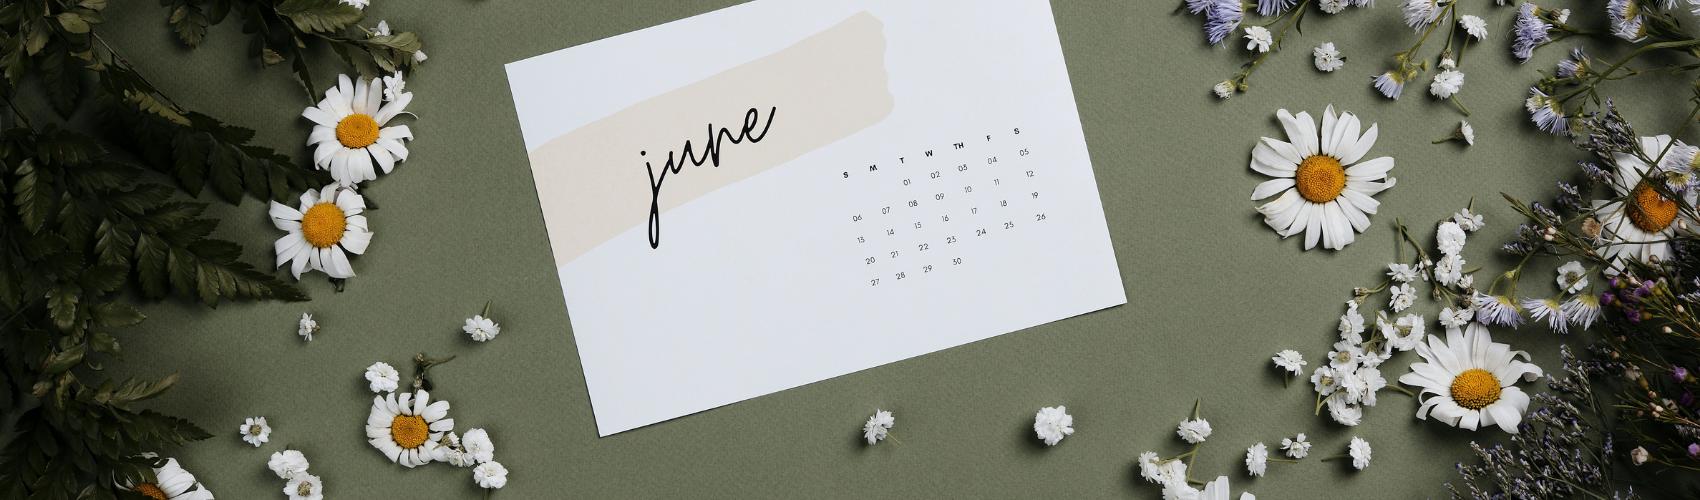 Gardening activities to do in the month of June